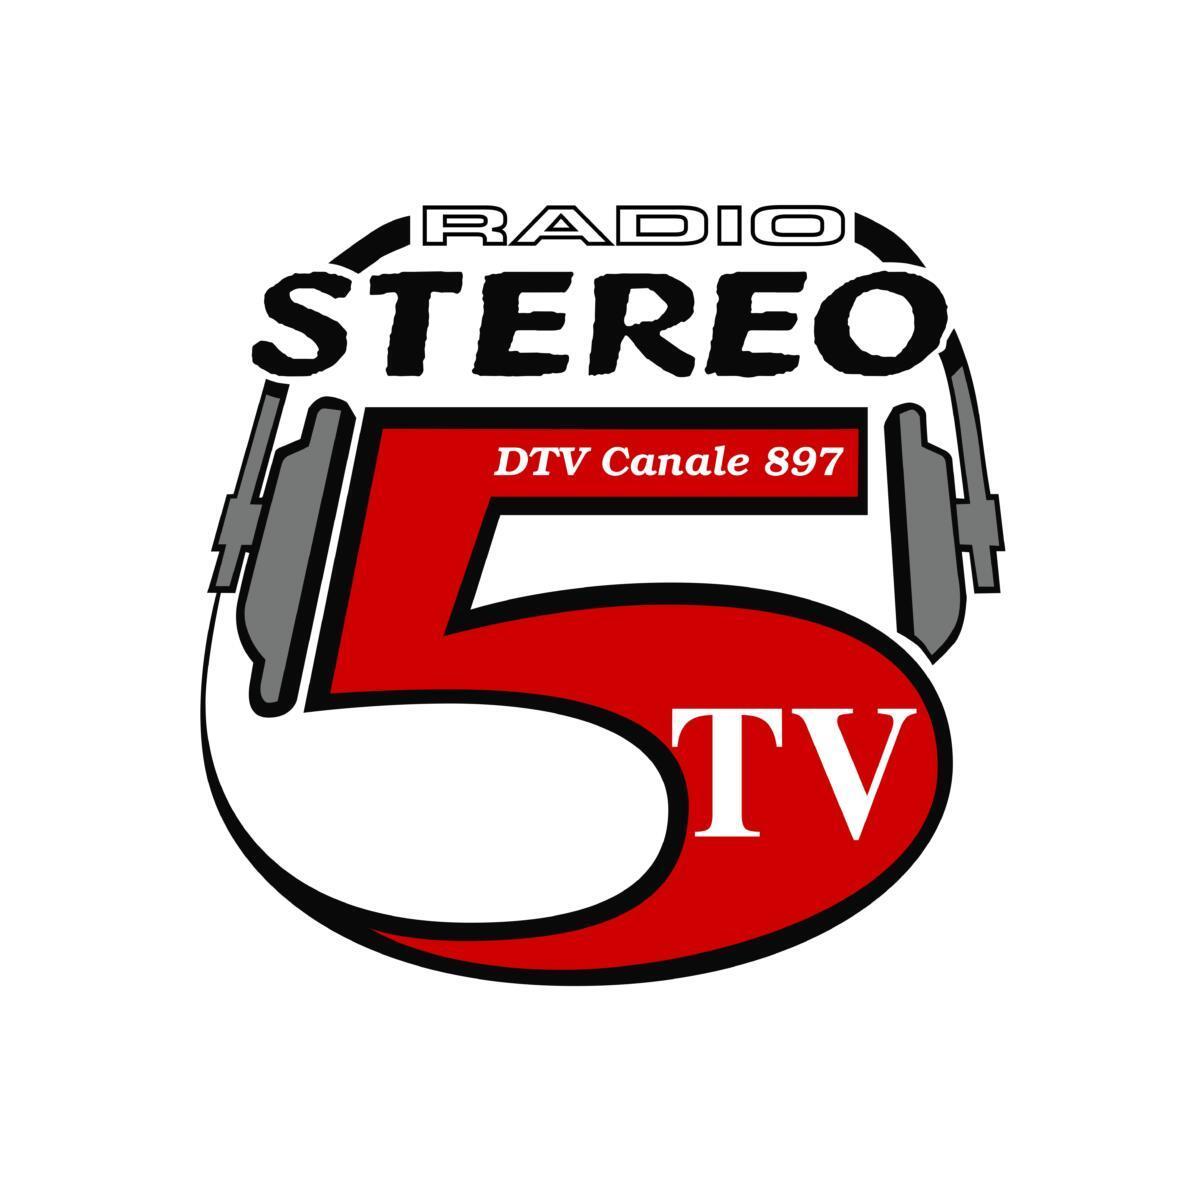 LOGO ORIGINALE STEREO 5 TV